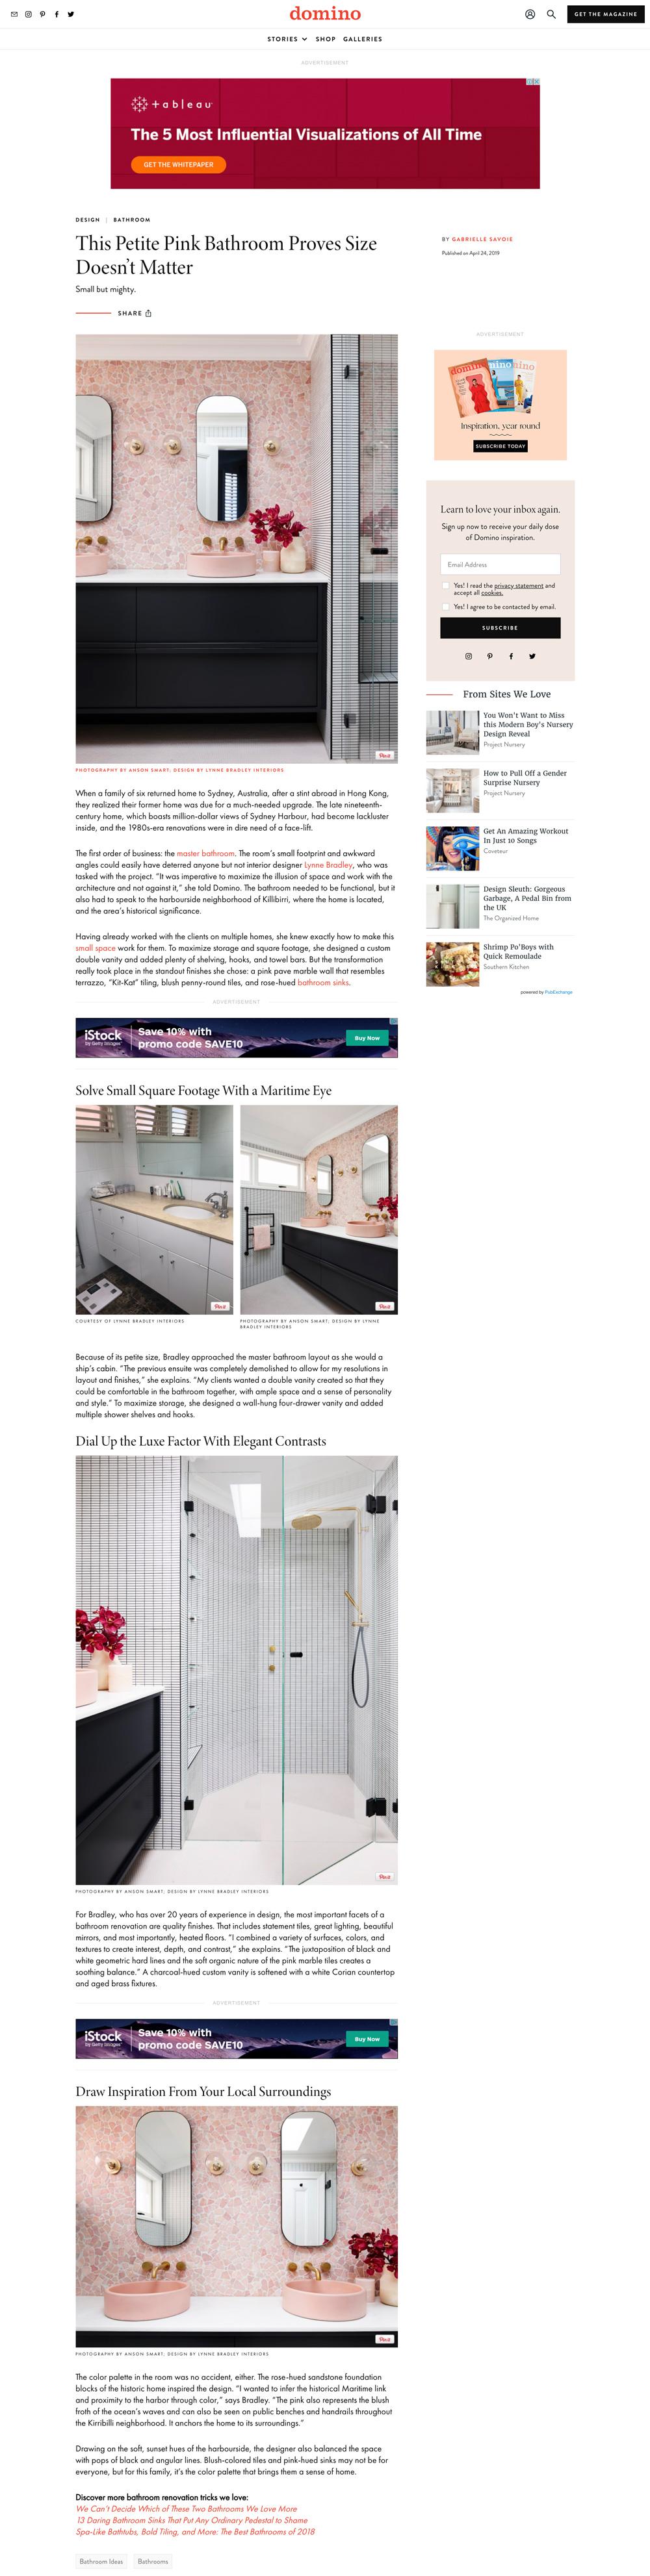 screencapture-domino-content-pink-bathroom-decor-2019-08-22-15_28_50.jpg